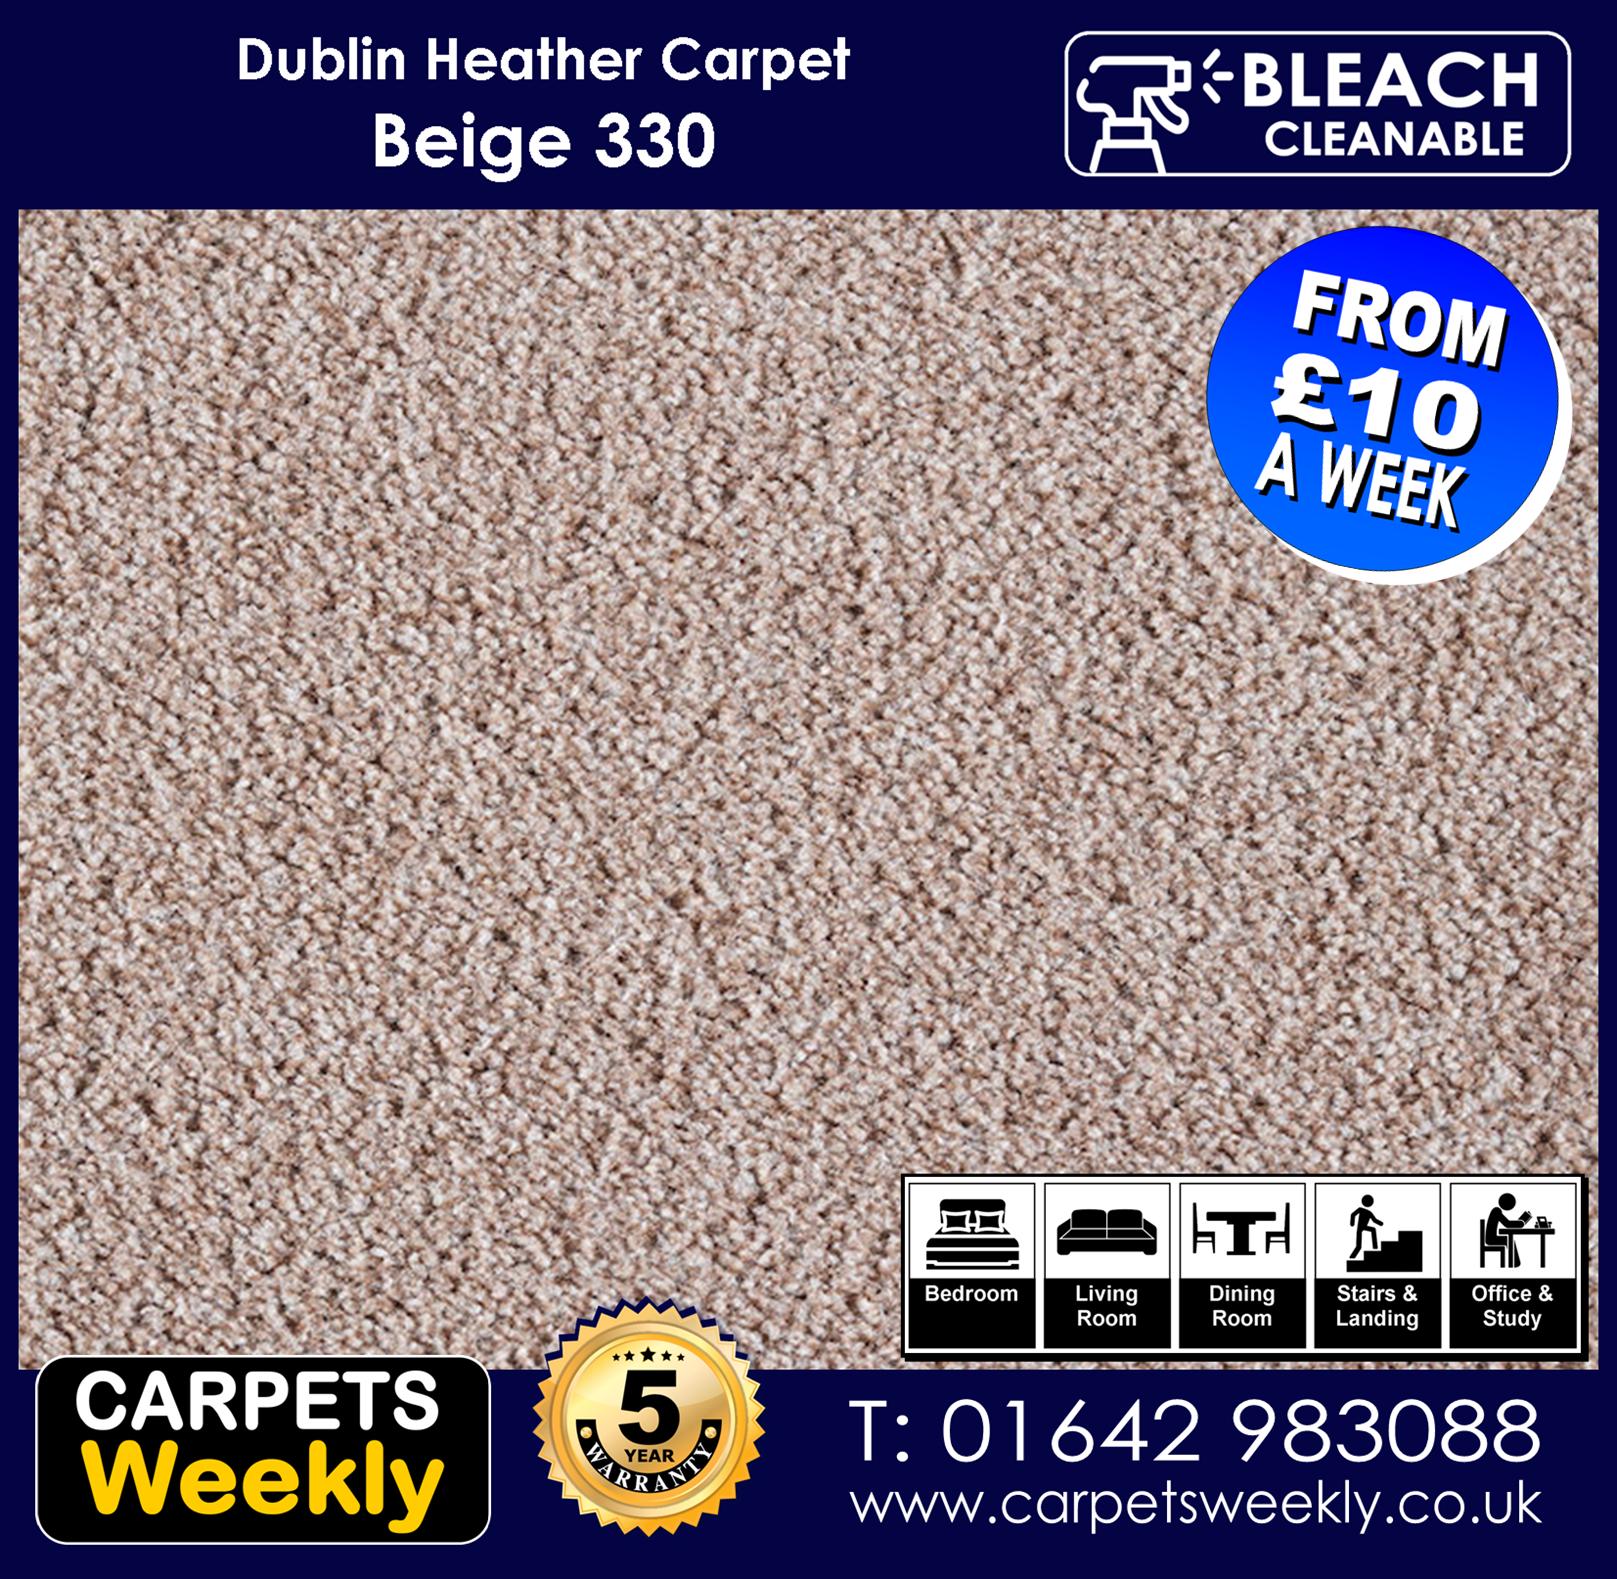 Carpets Weekly Dublin Heather Dublin Beige - 330 mid range carpet